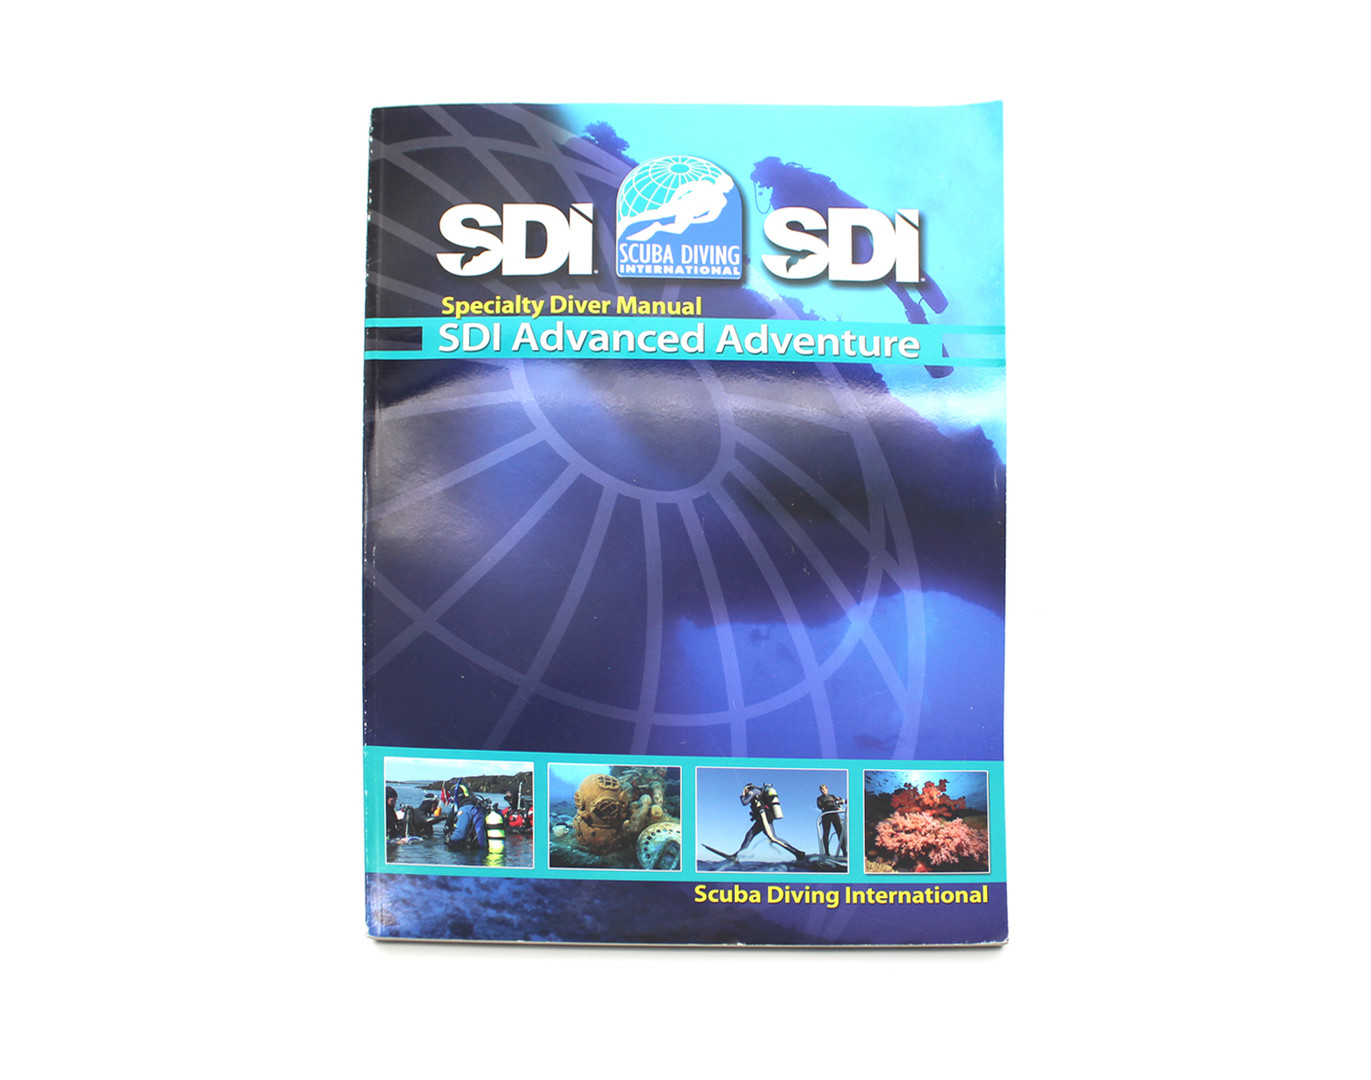 SDI CVR.jpg